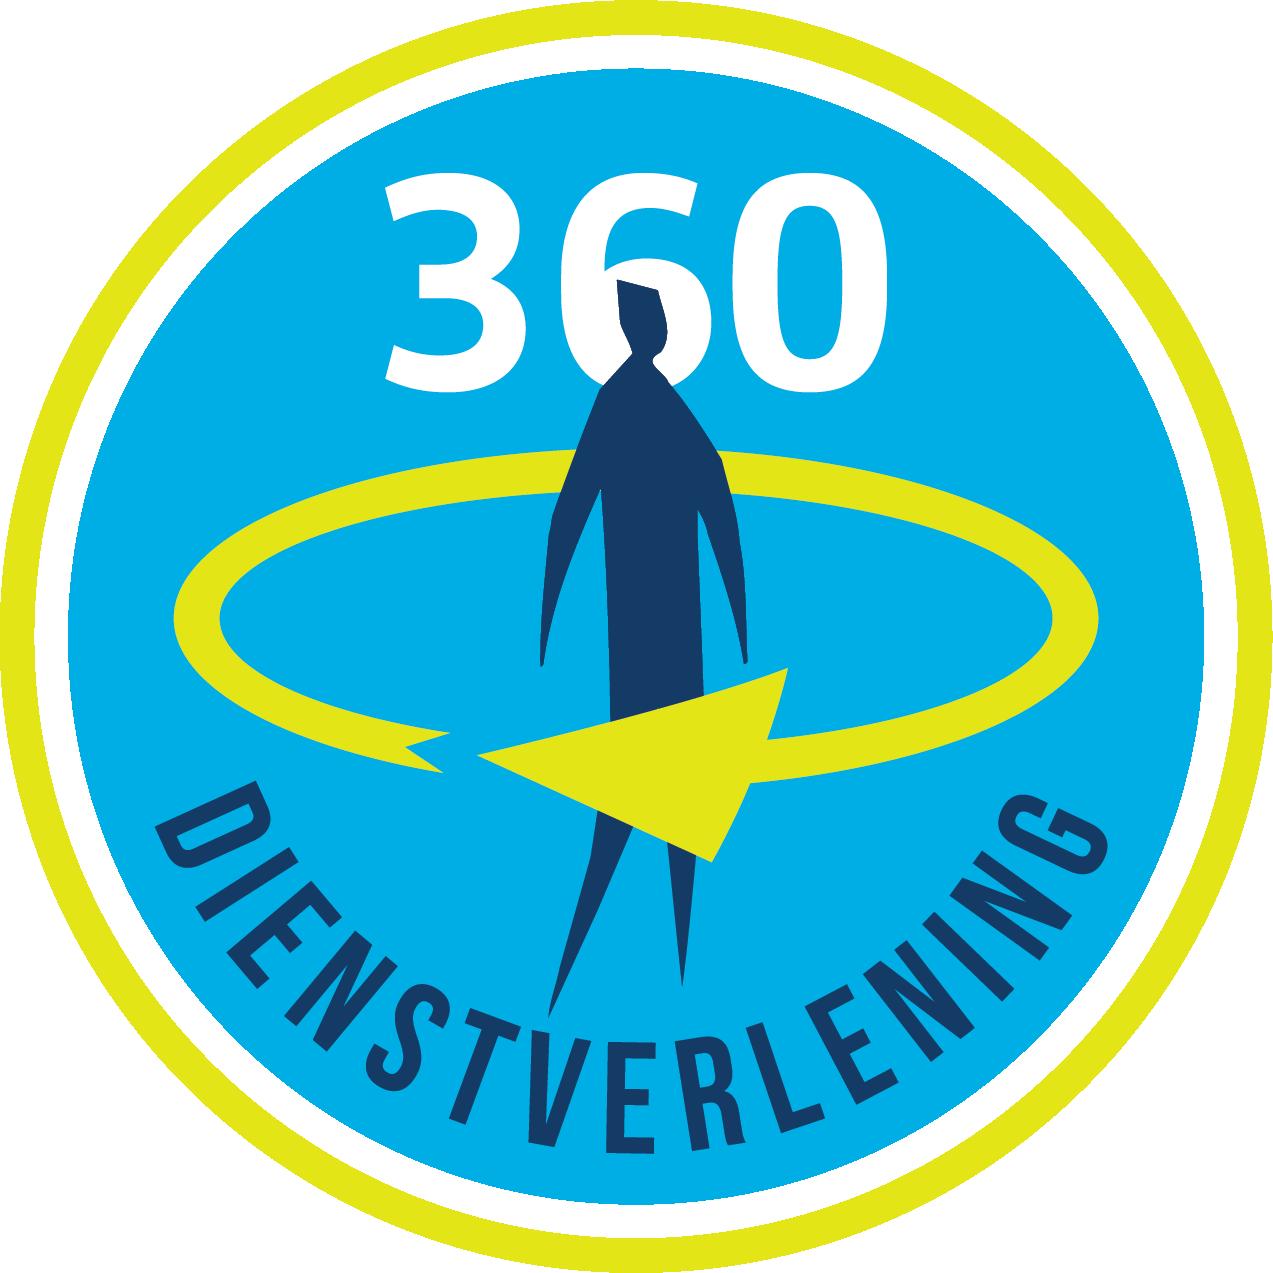 aclvb-universele_diensten-logo-cmyk_ok-2_6.png